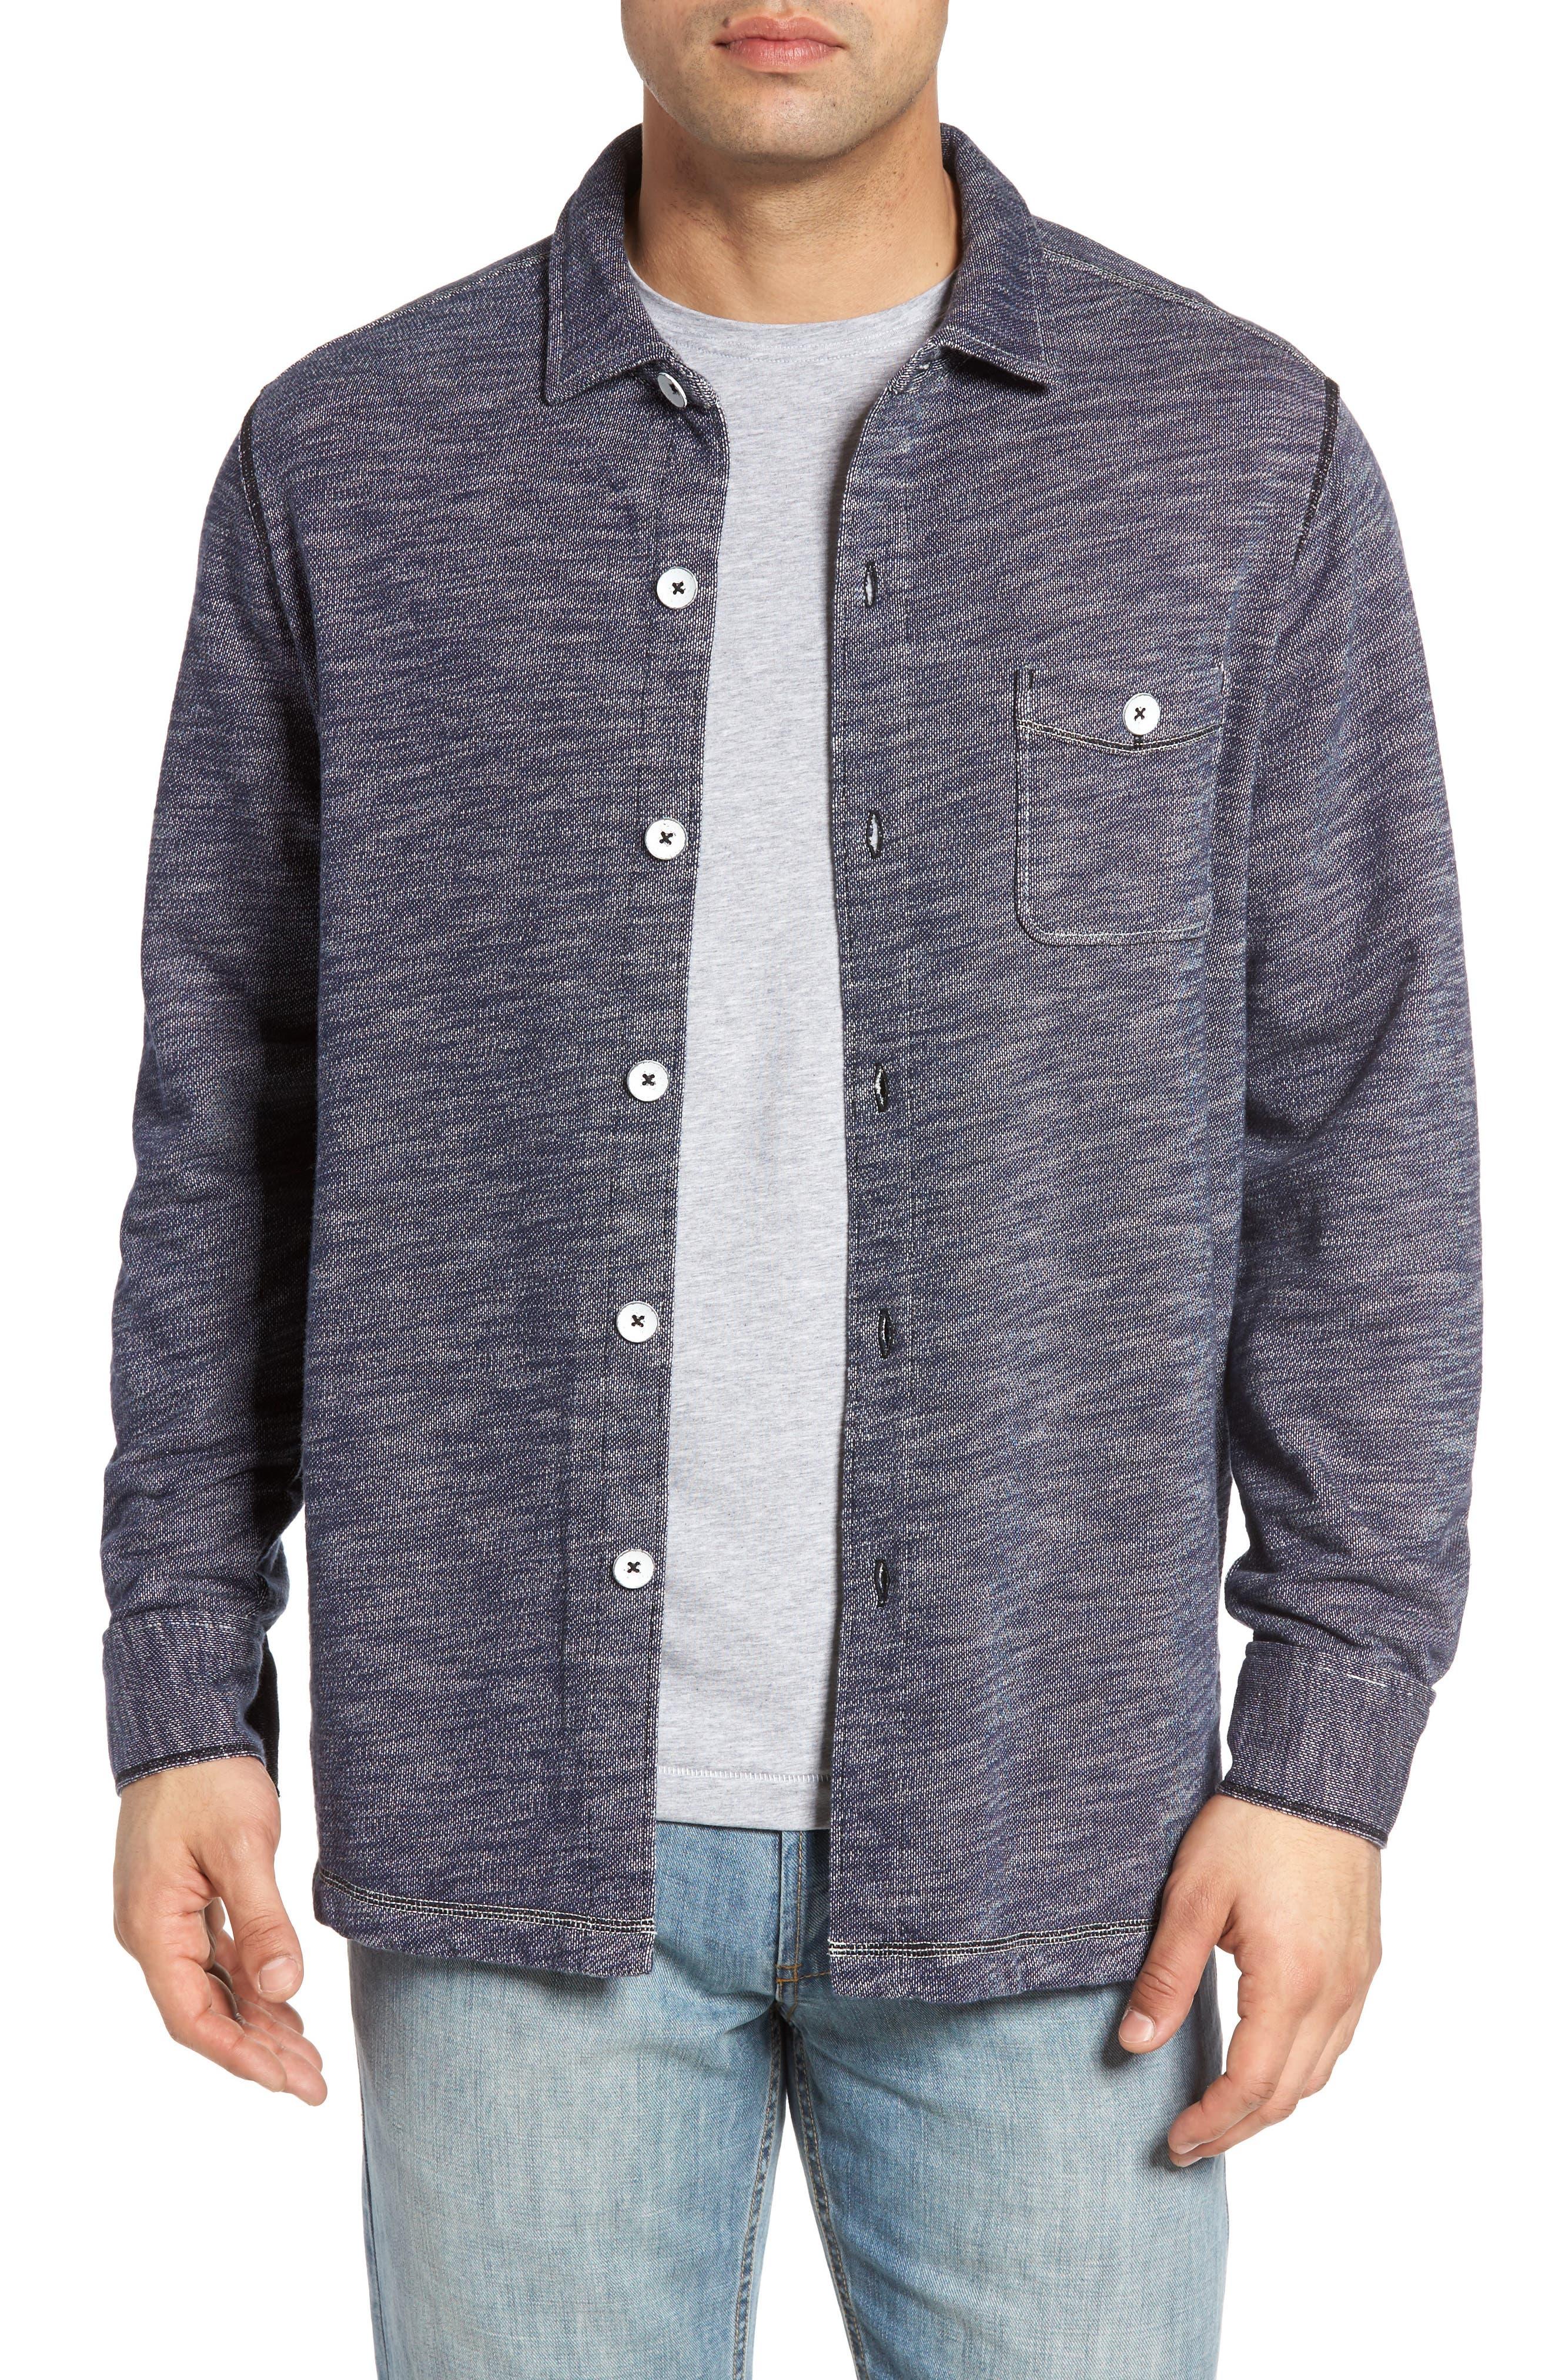 Beach Ridge Shirt Jacket,                             Main thumbnail 1, color,                             400